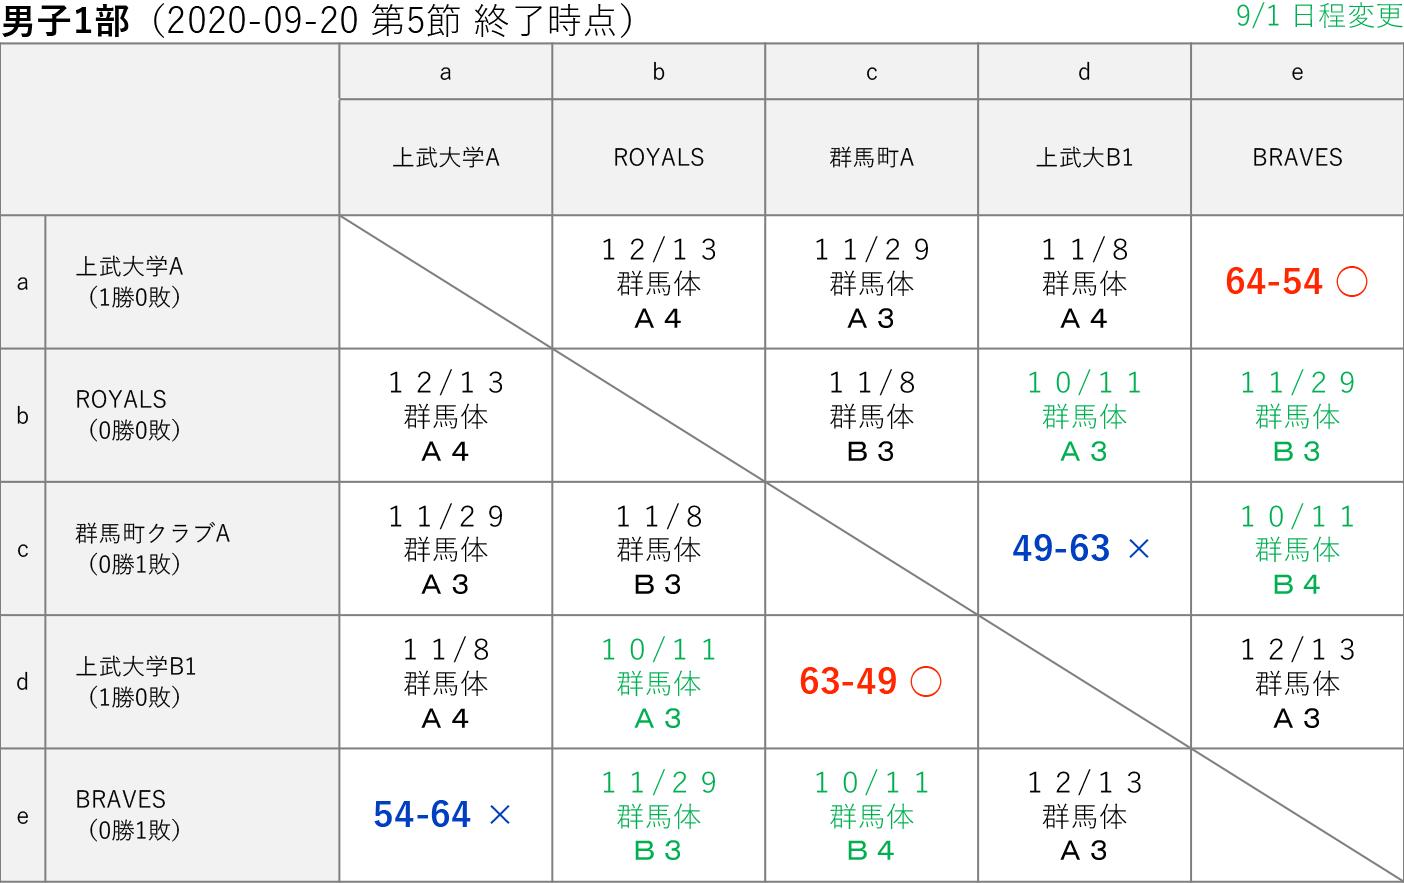 2020社会人リーグ 男子1部 星取り表 2020-09-20(第5節終了時)